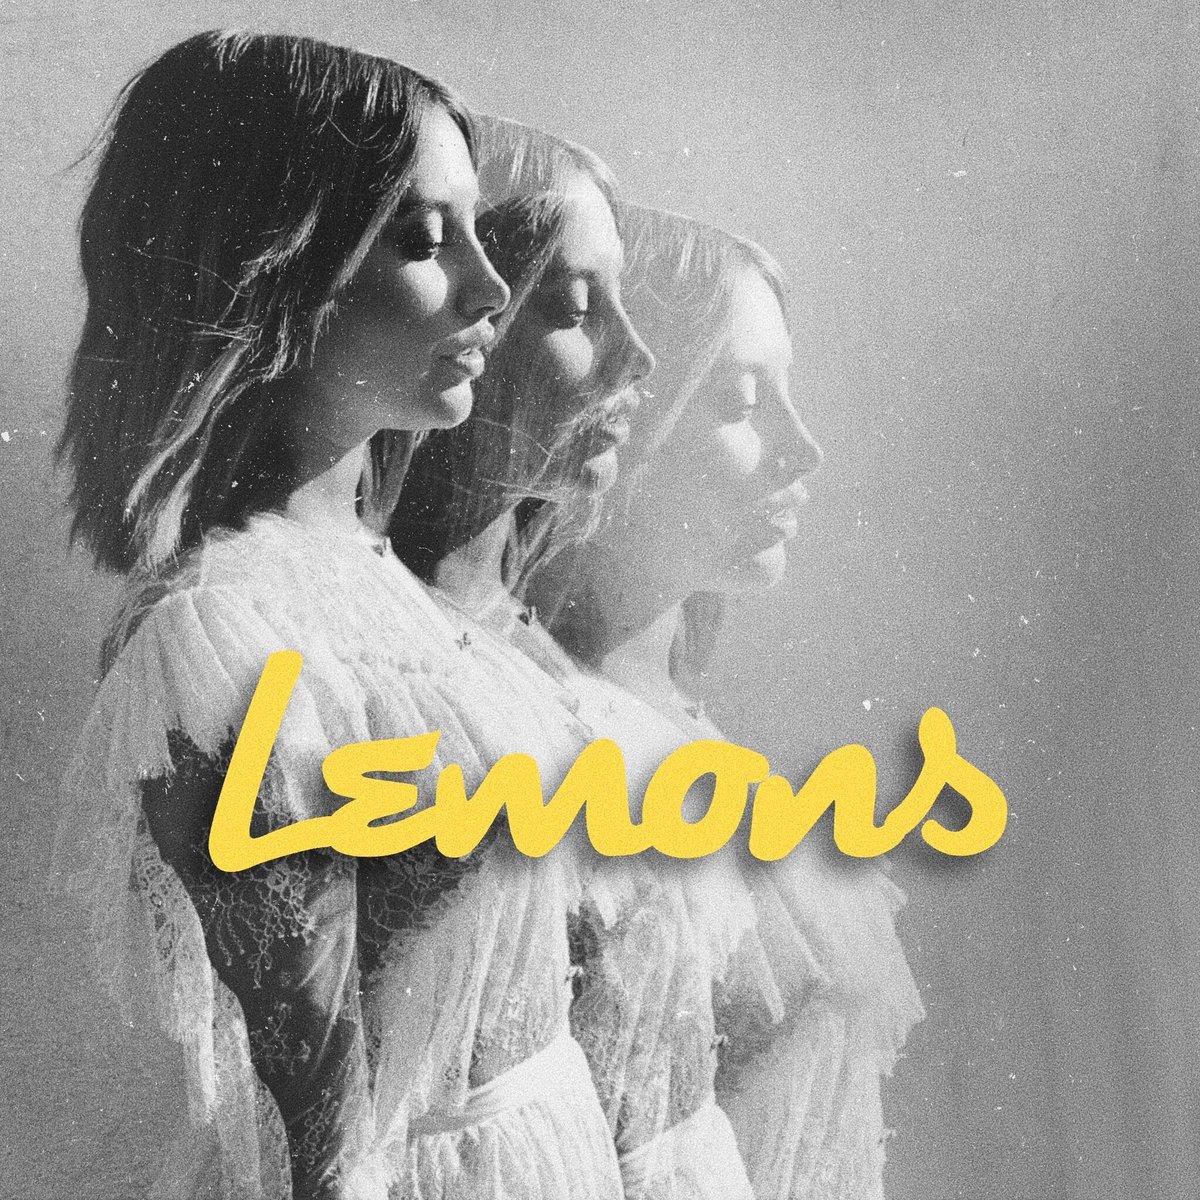 @ashleytisdale #LEMONS is so so so good 🙌🏻🍋 (my edit)